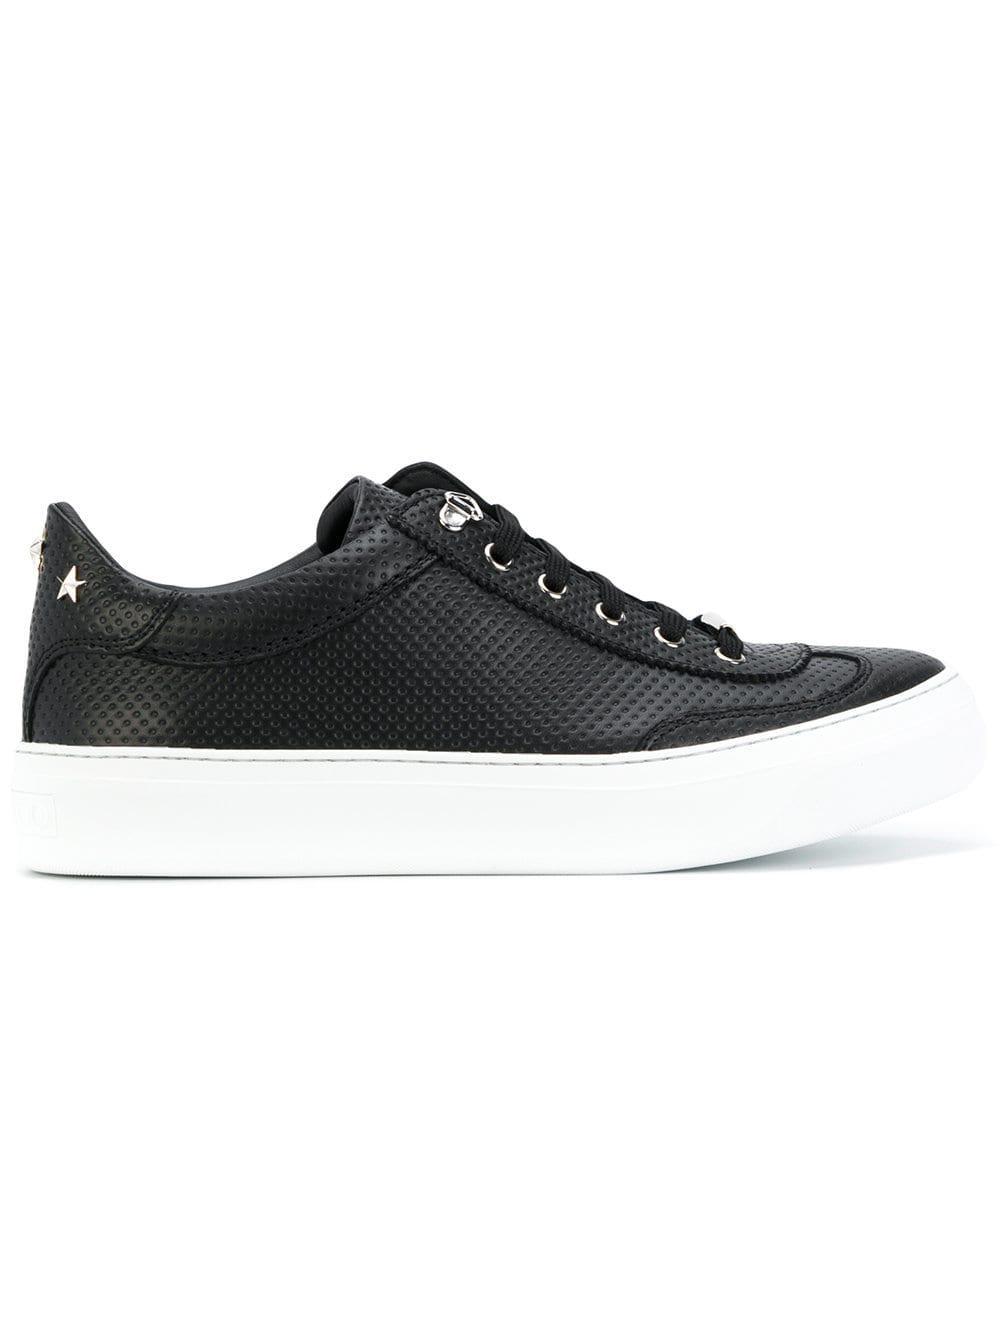 Jimmy Choo Leather Wedge Sole Sneakers in Black